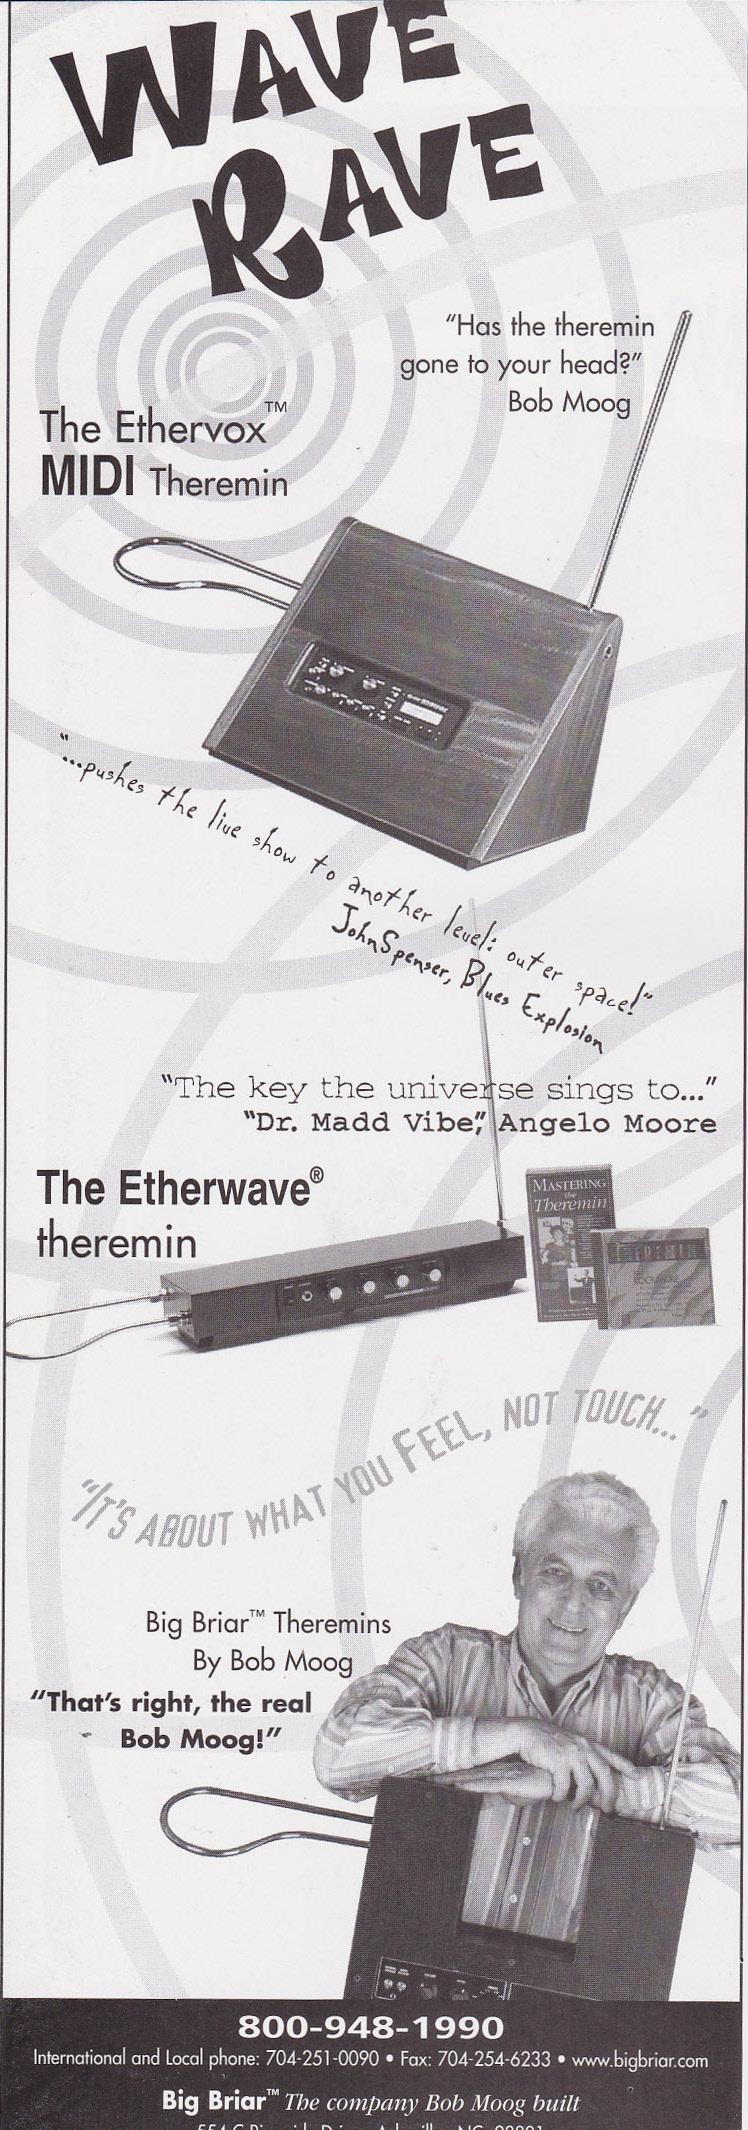 Jon Spencer - Wave Rave (ADVERT, US)